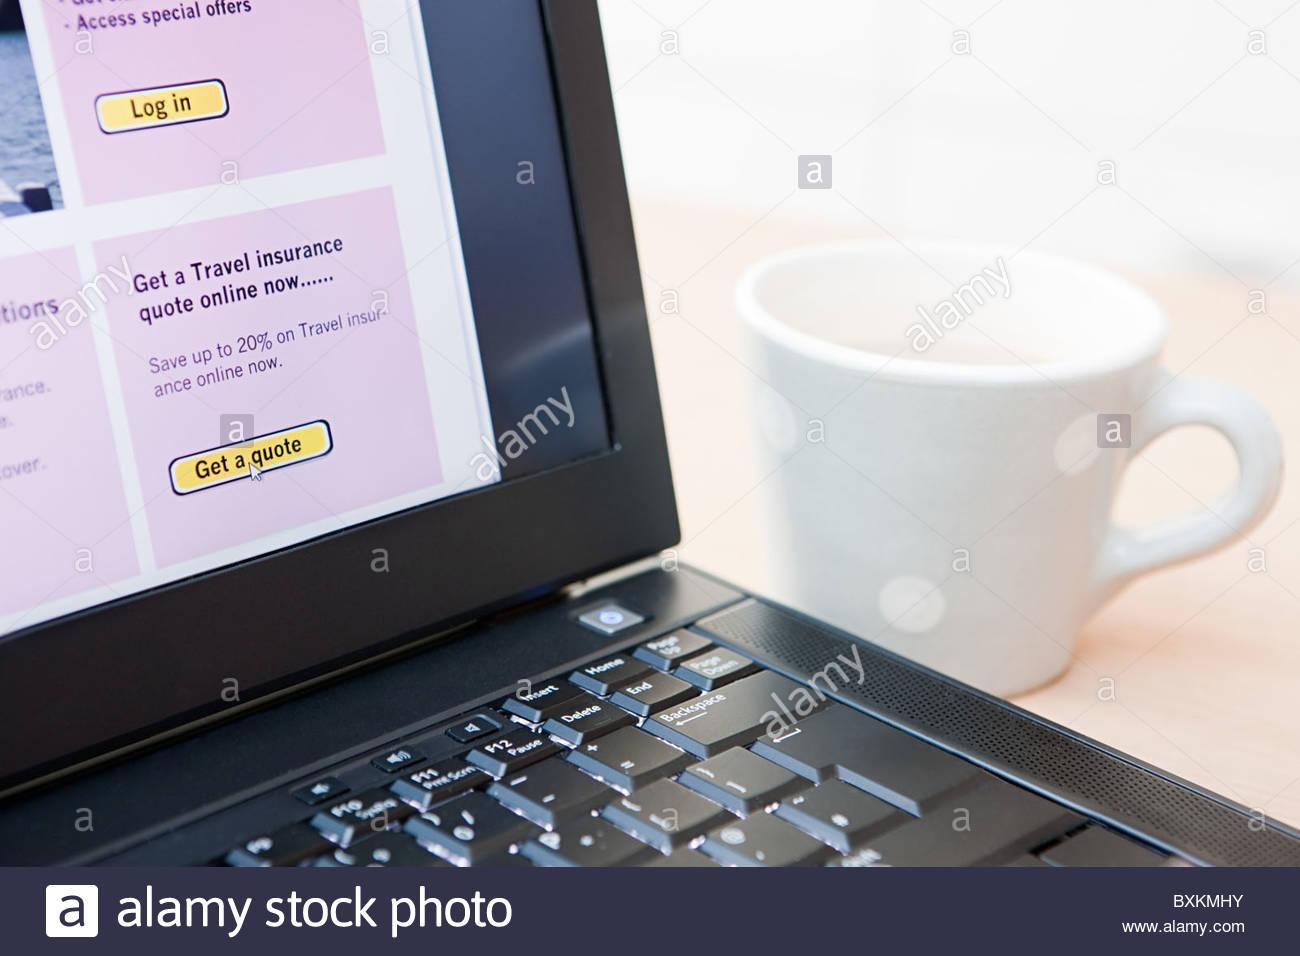 Travel insurance on laptop - Stock Image